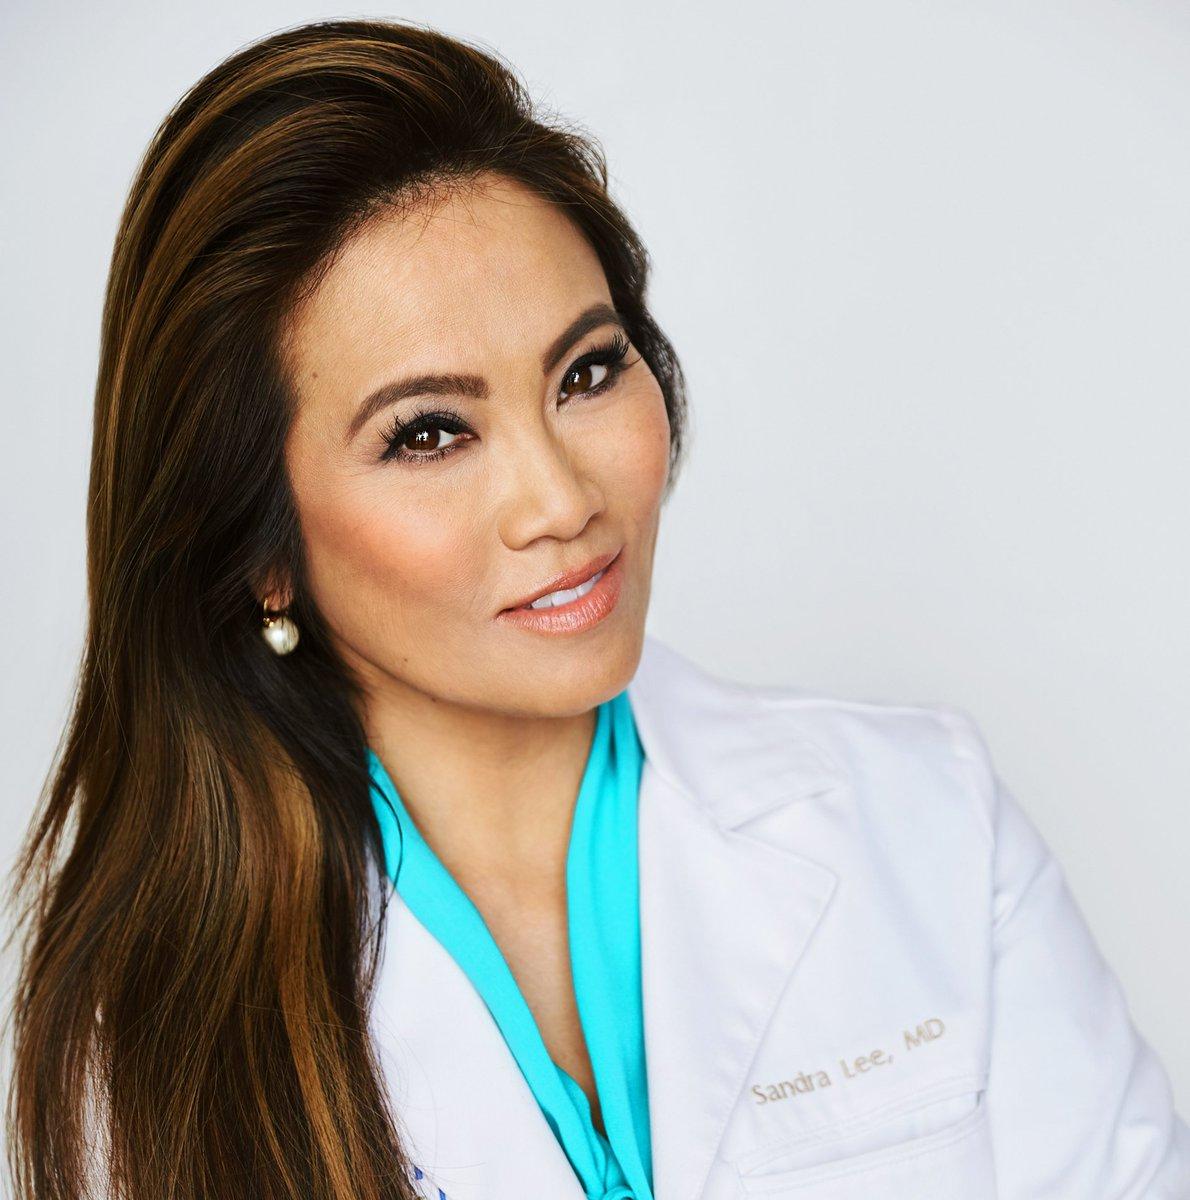 Dr Sandra Lee Dr Pimple Popper Appeal Blackhead Videos